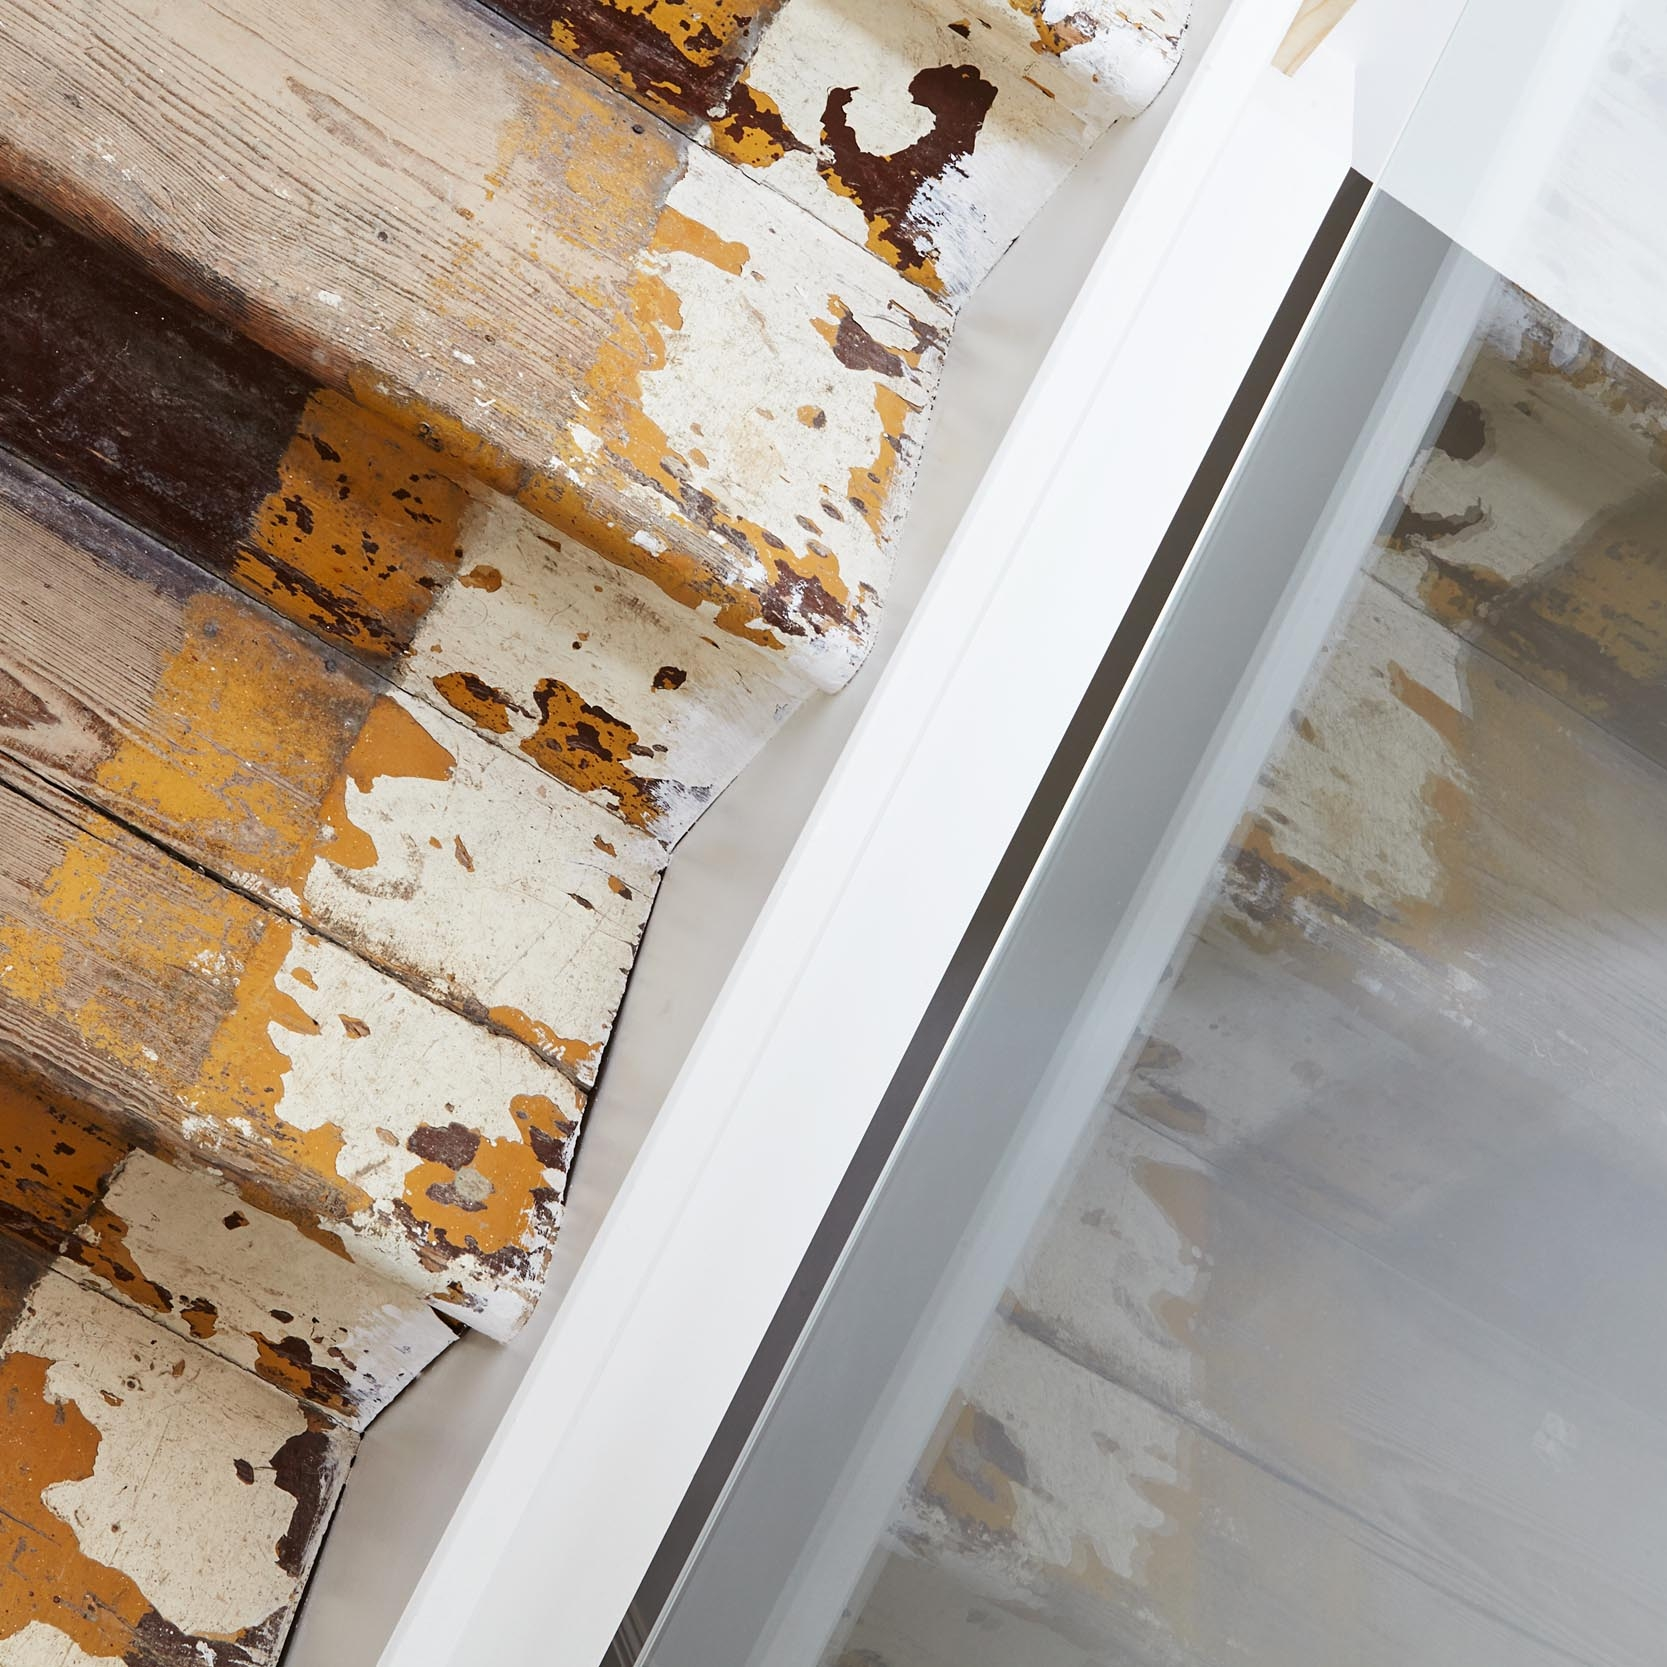 Balustrade - Bravington - RYE Design